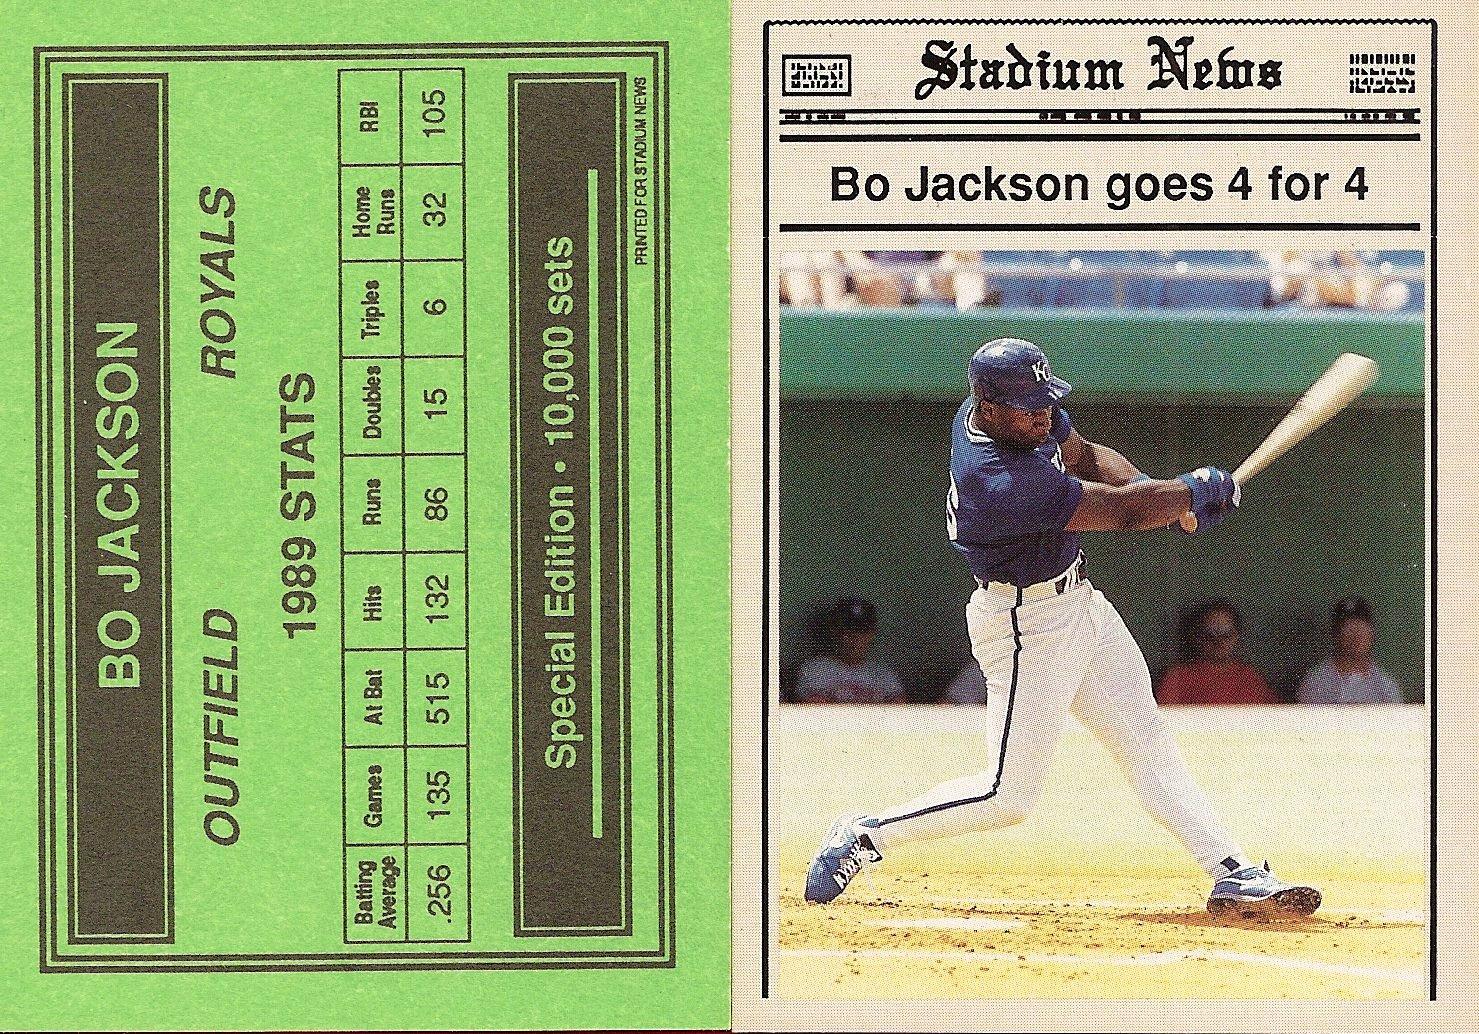 1990 Stadium News 'Special Edition'